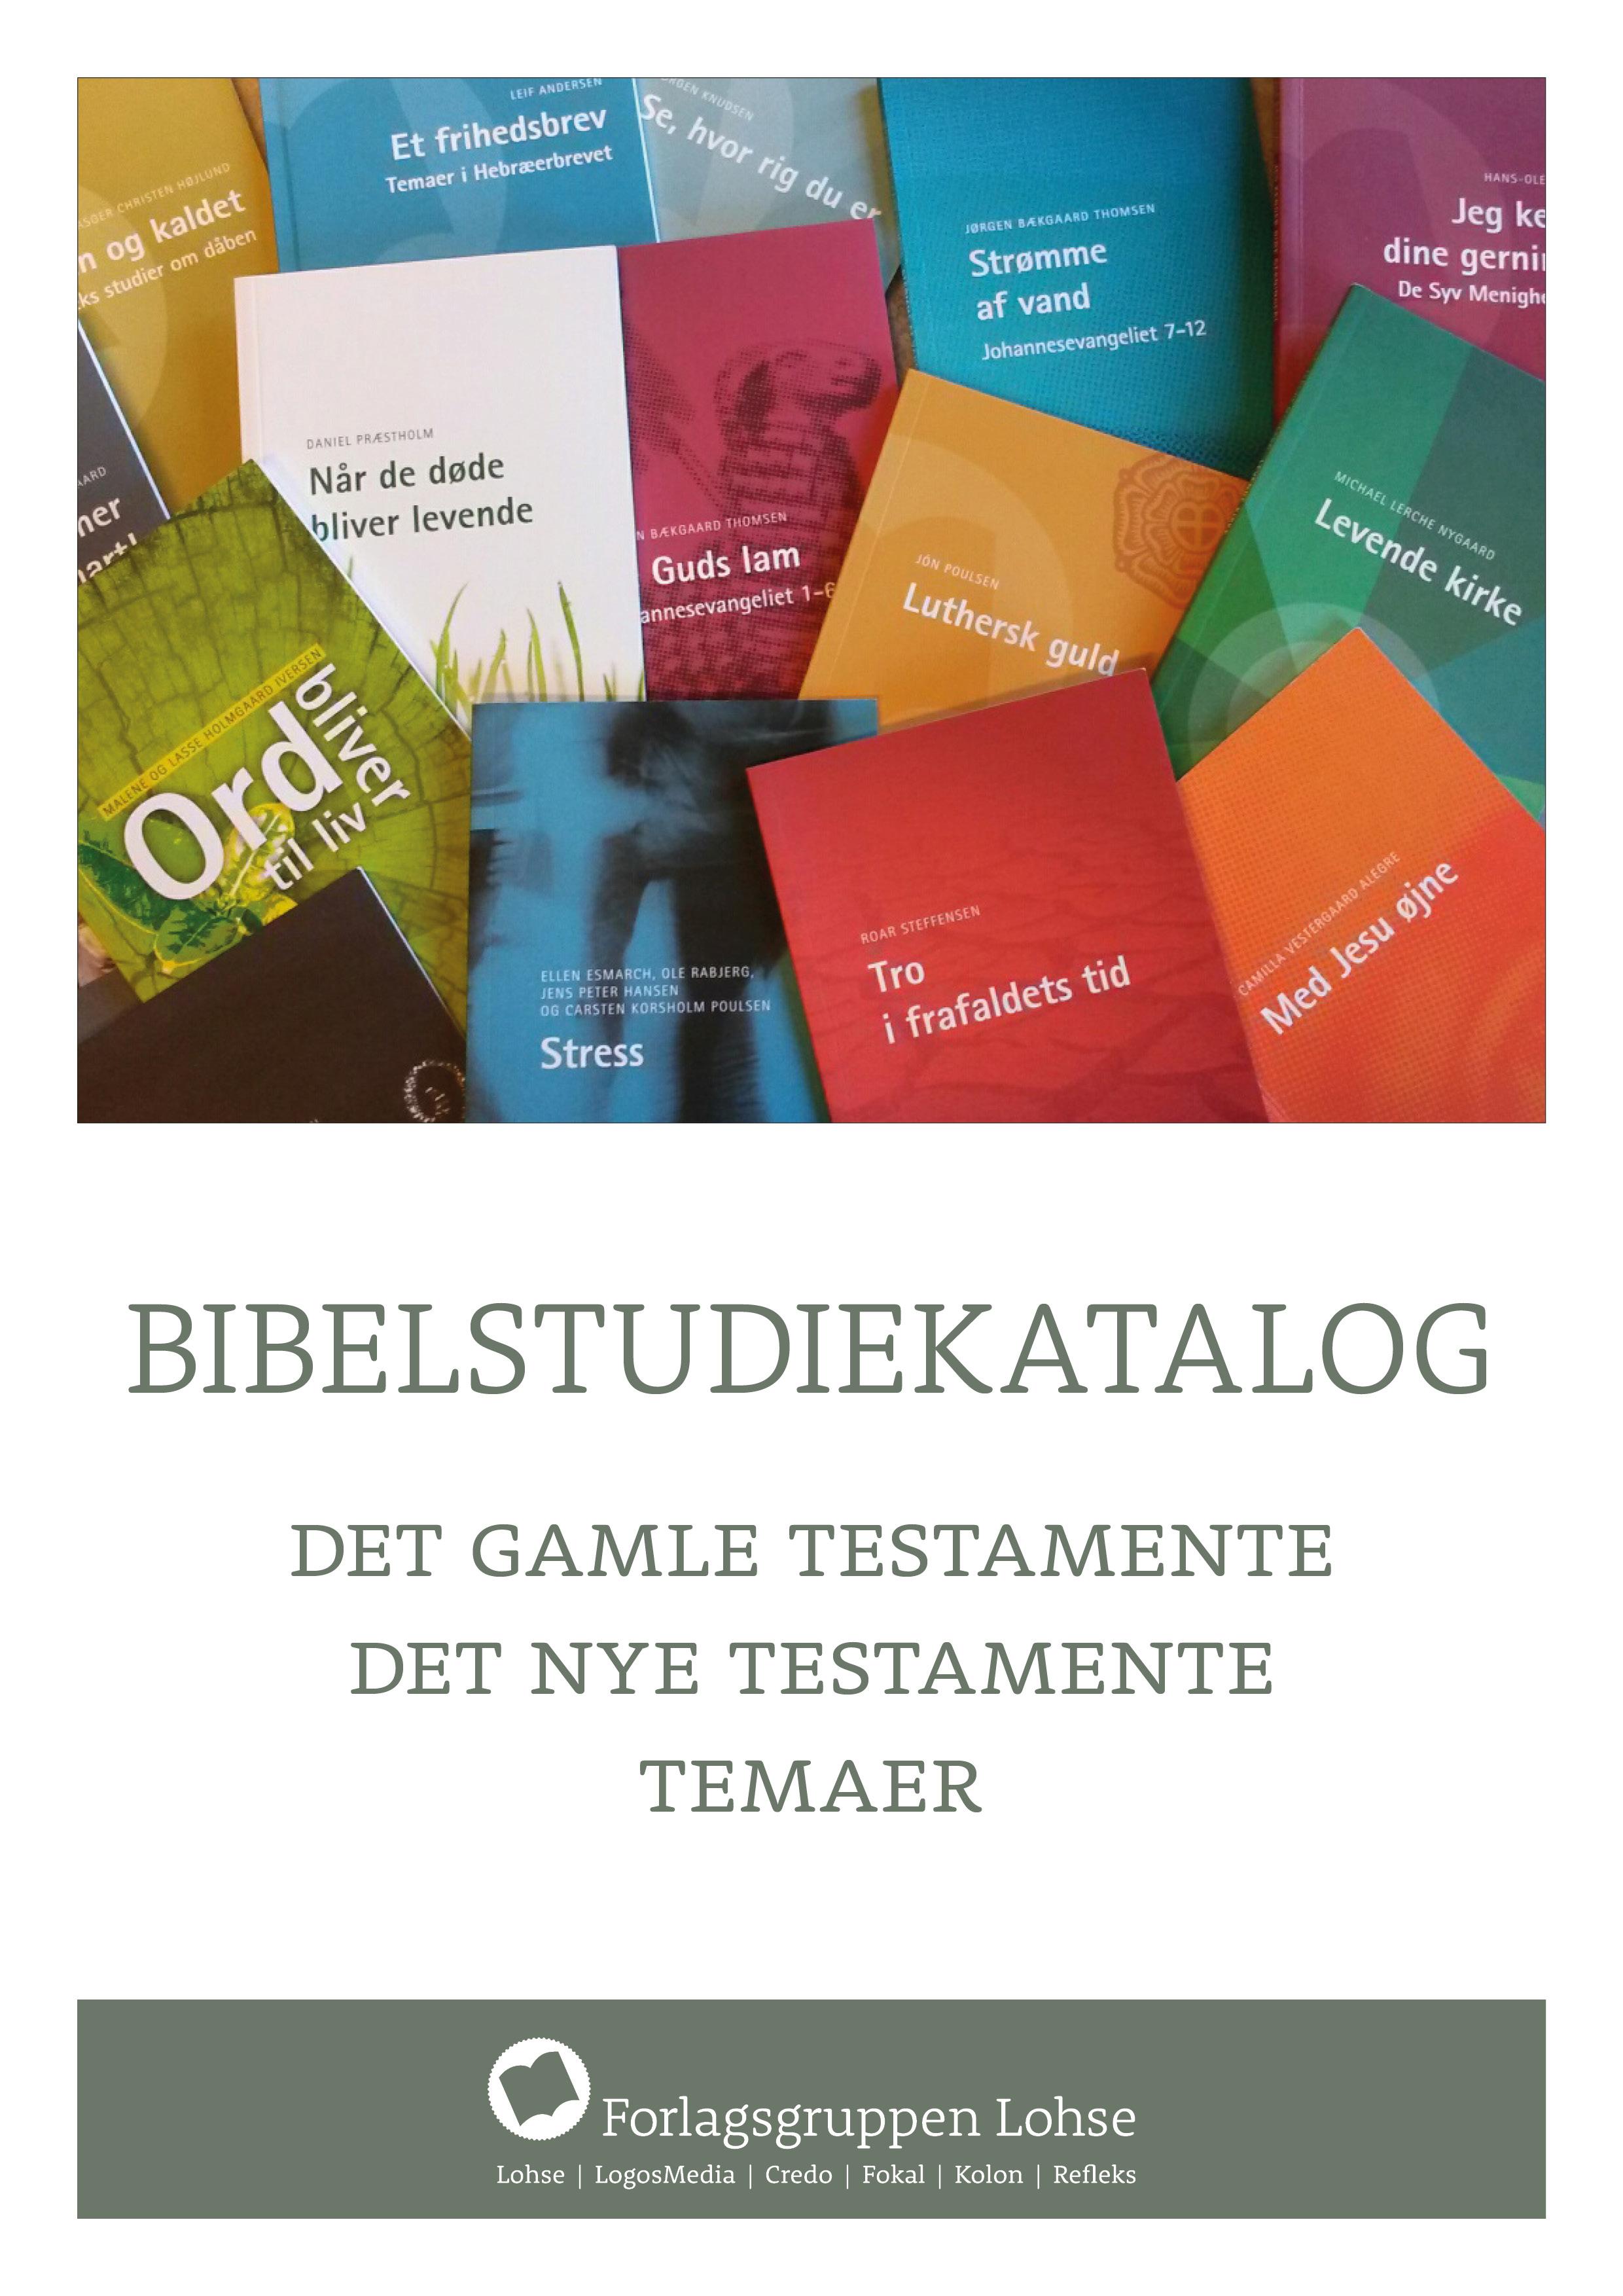 Bibelstudiekatalog